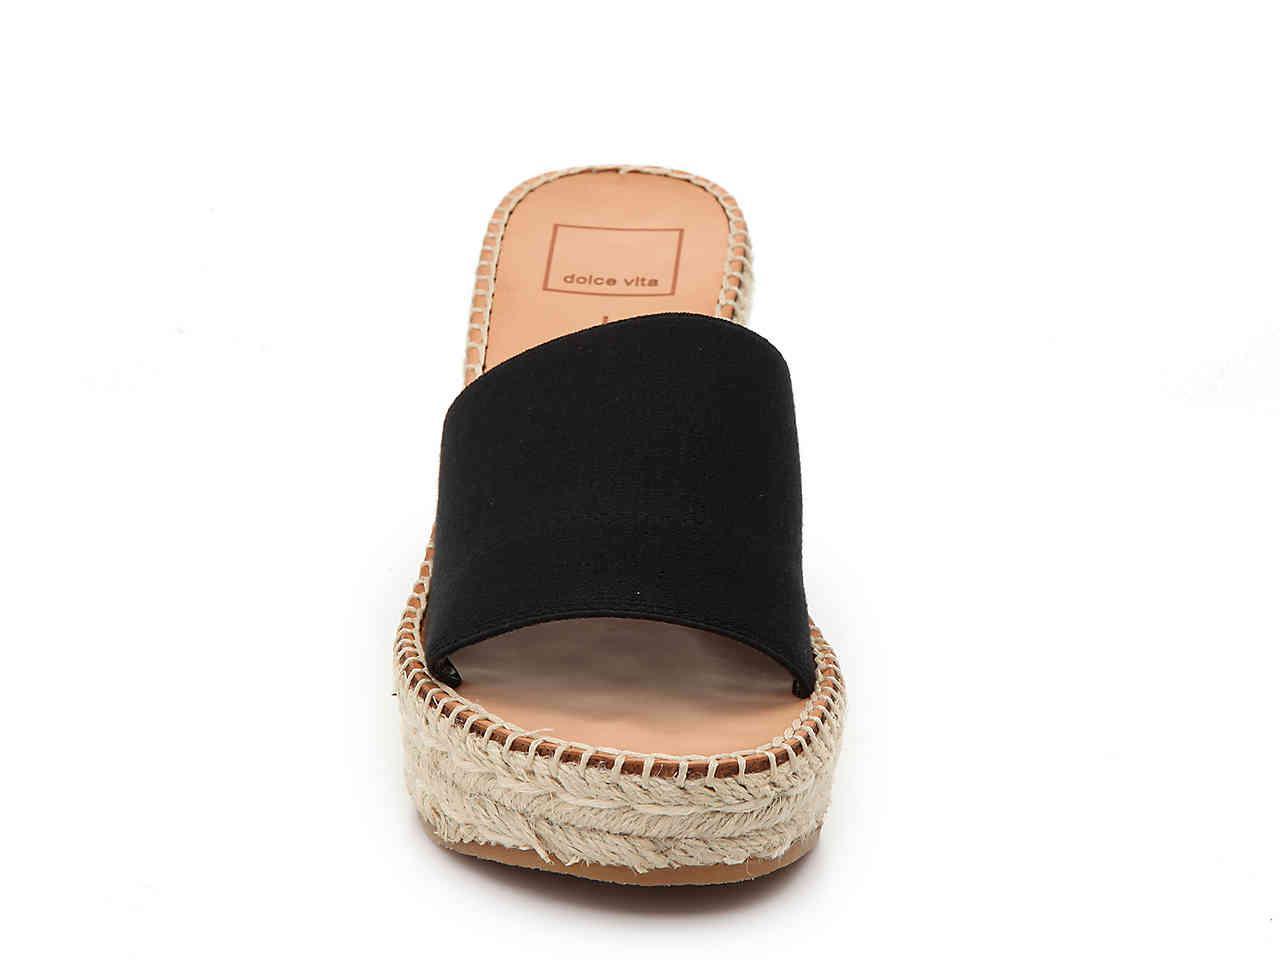 9263d44ad41 Dolce Vita - Black Pim Espadrille Wedge Sandal - Lyst. View fullscreen